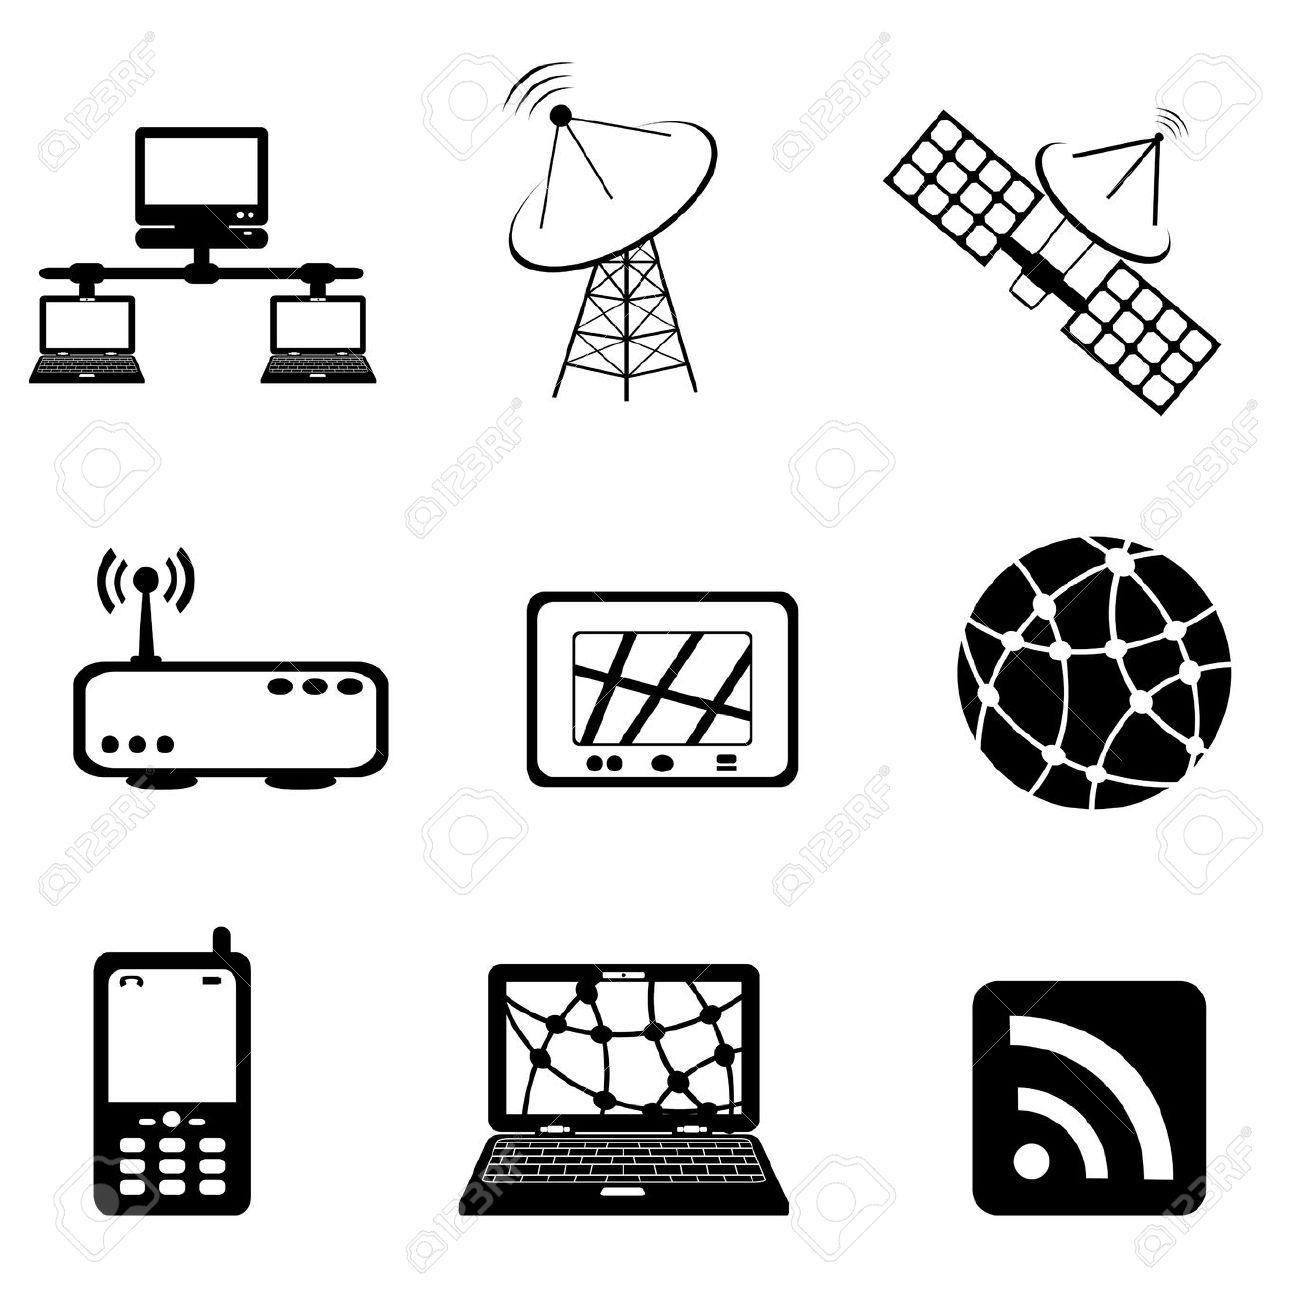 Communication Technology Clipart